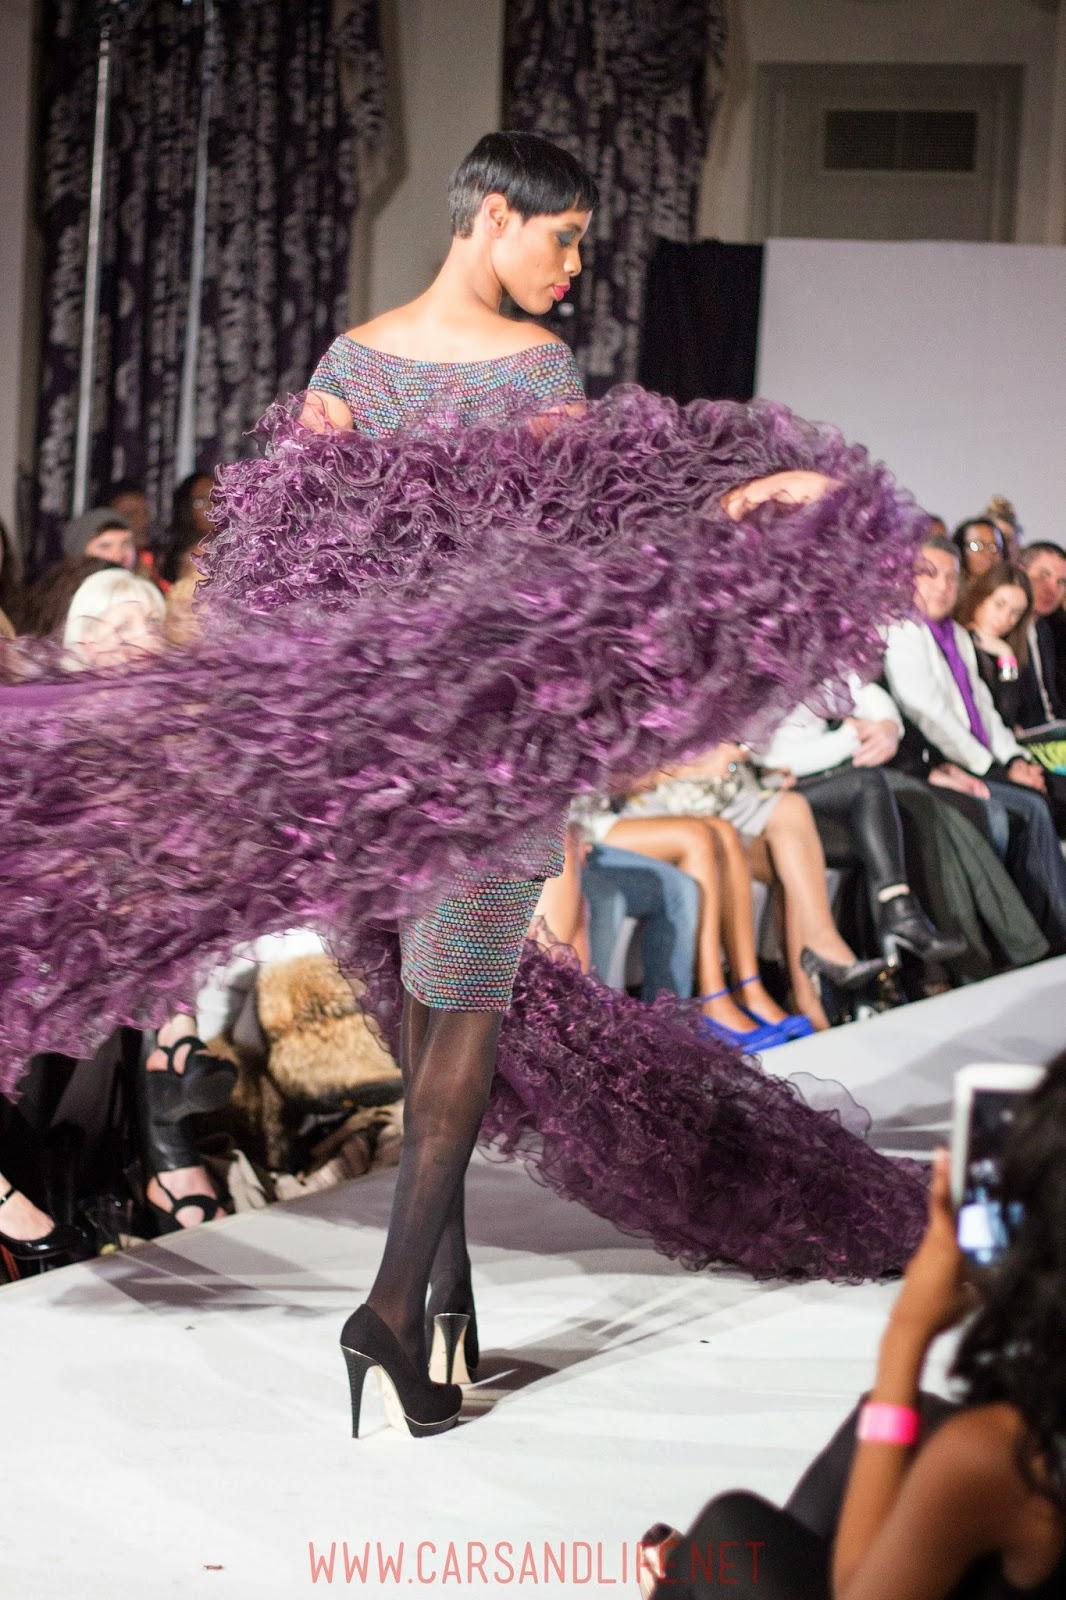 London Fashion Week 2014 | Fashions Finest Show Part II